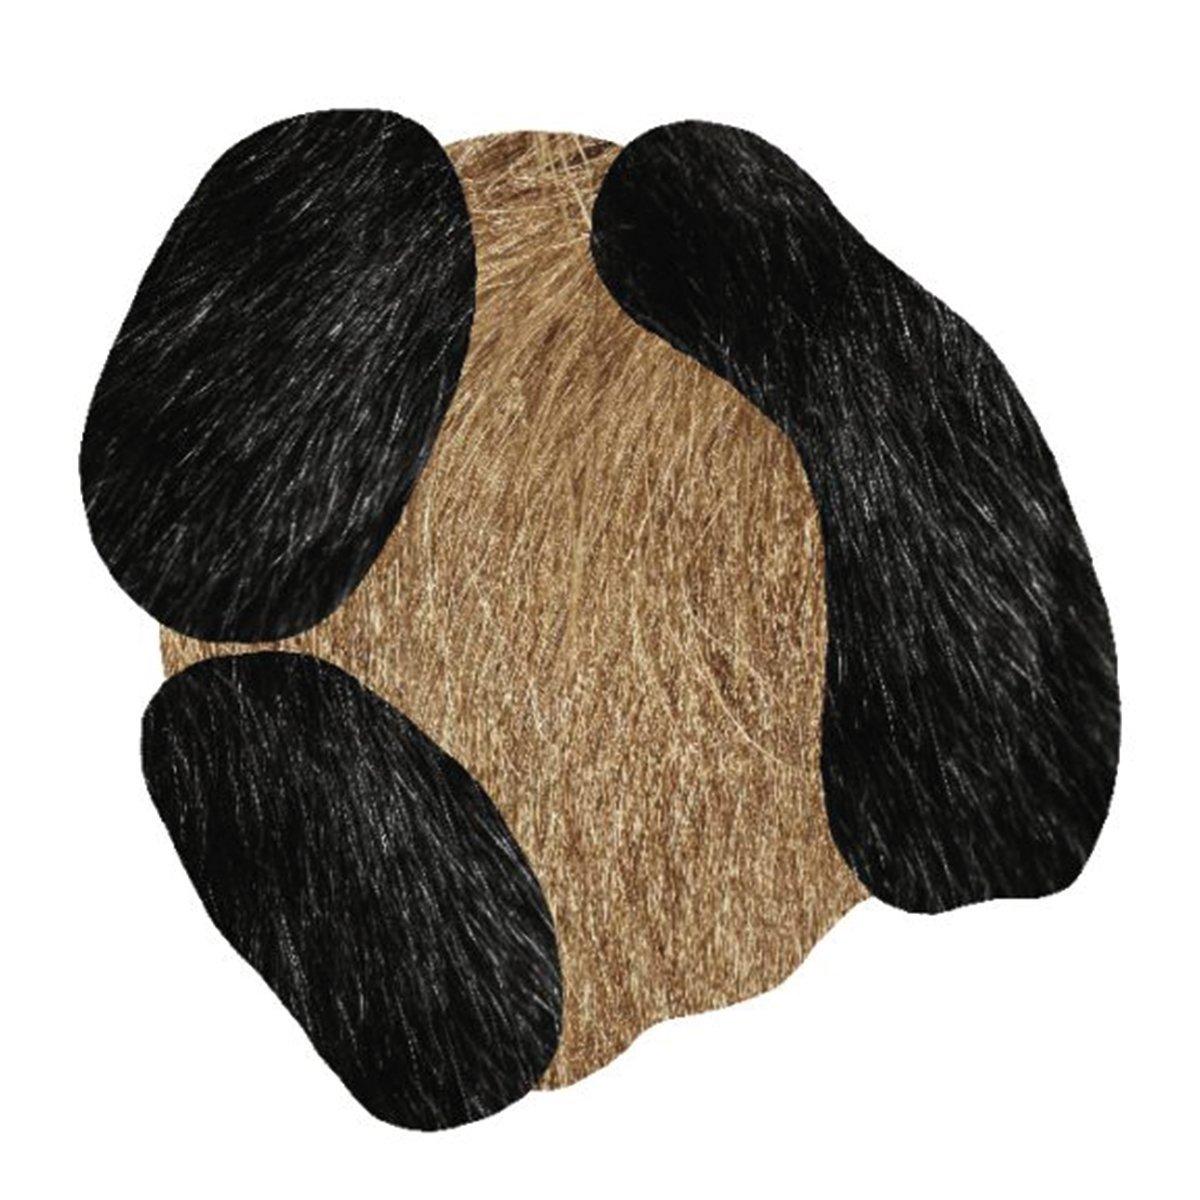 Moooi Carpets - Bearded Leopard Vloerkleed - 150 x 147 cm. - Soft Yarn